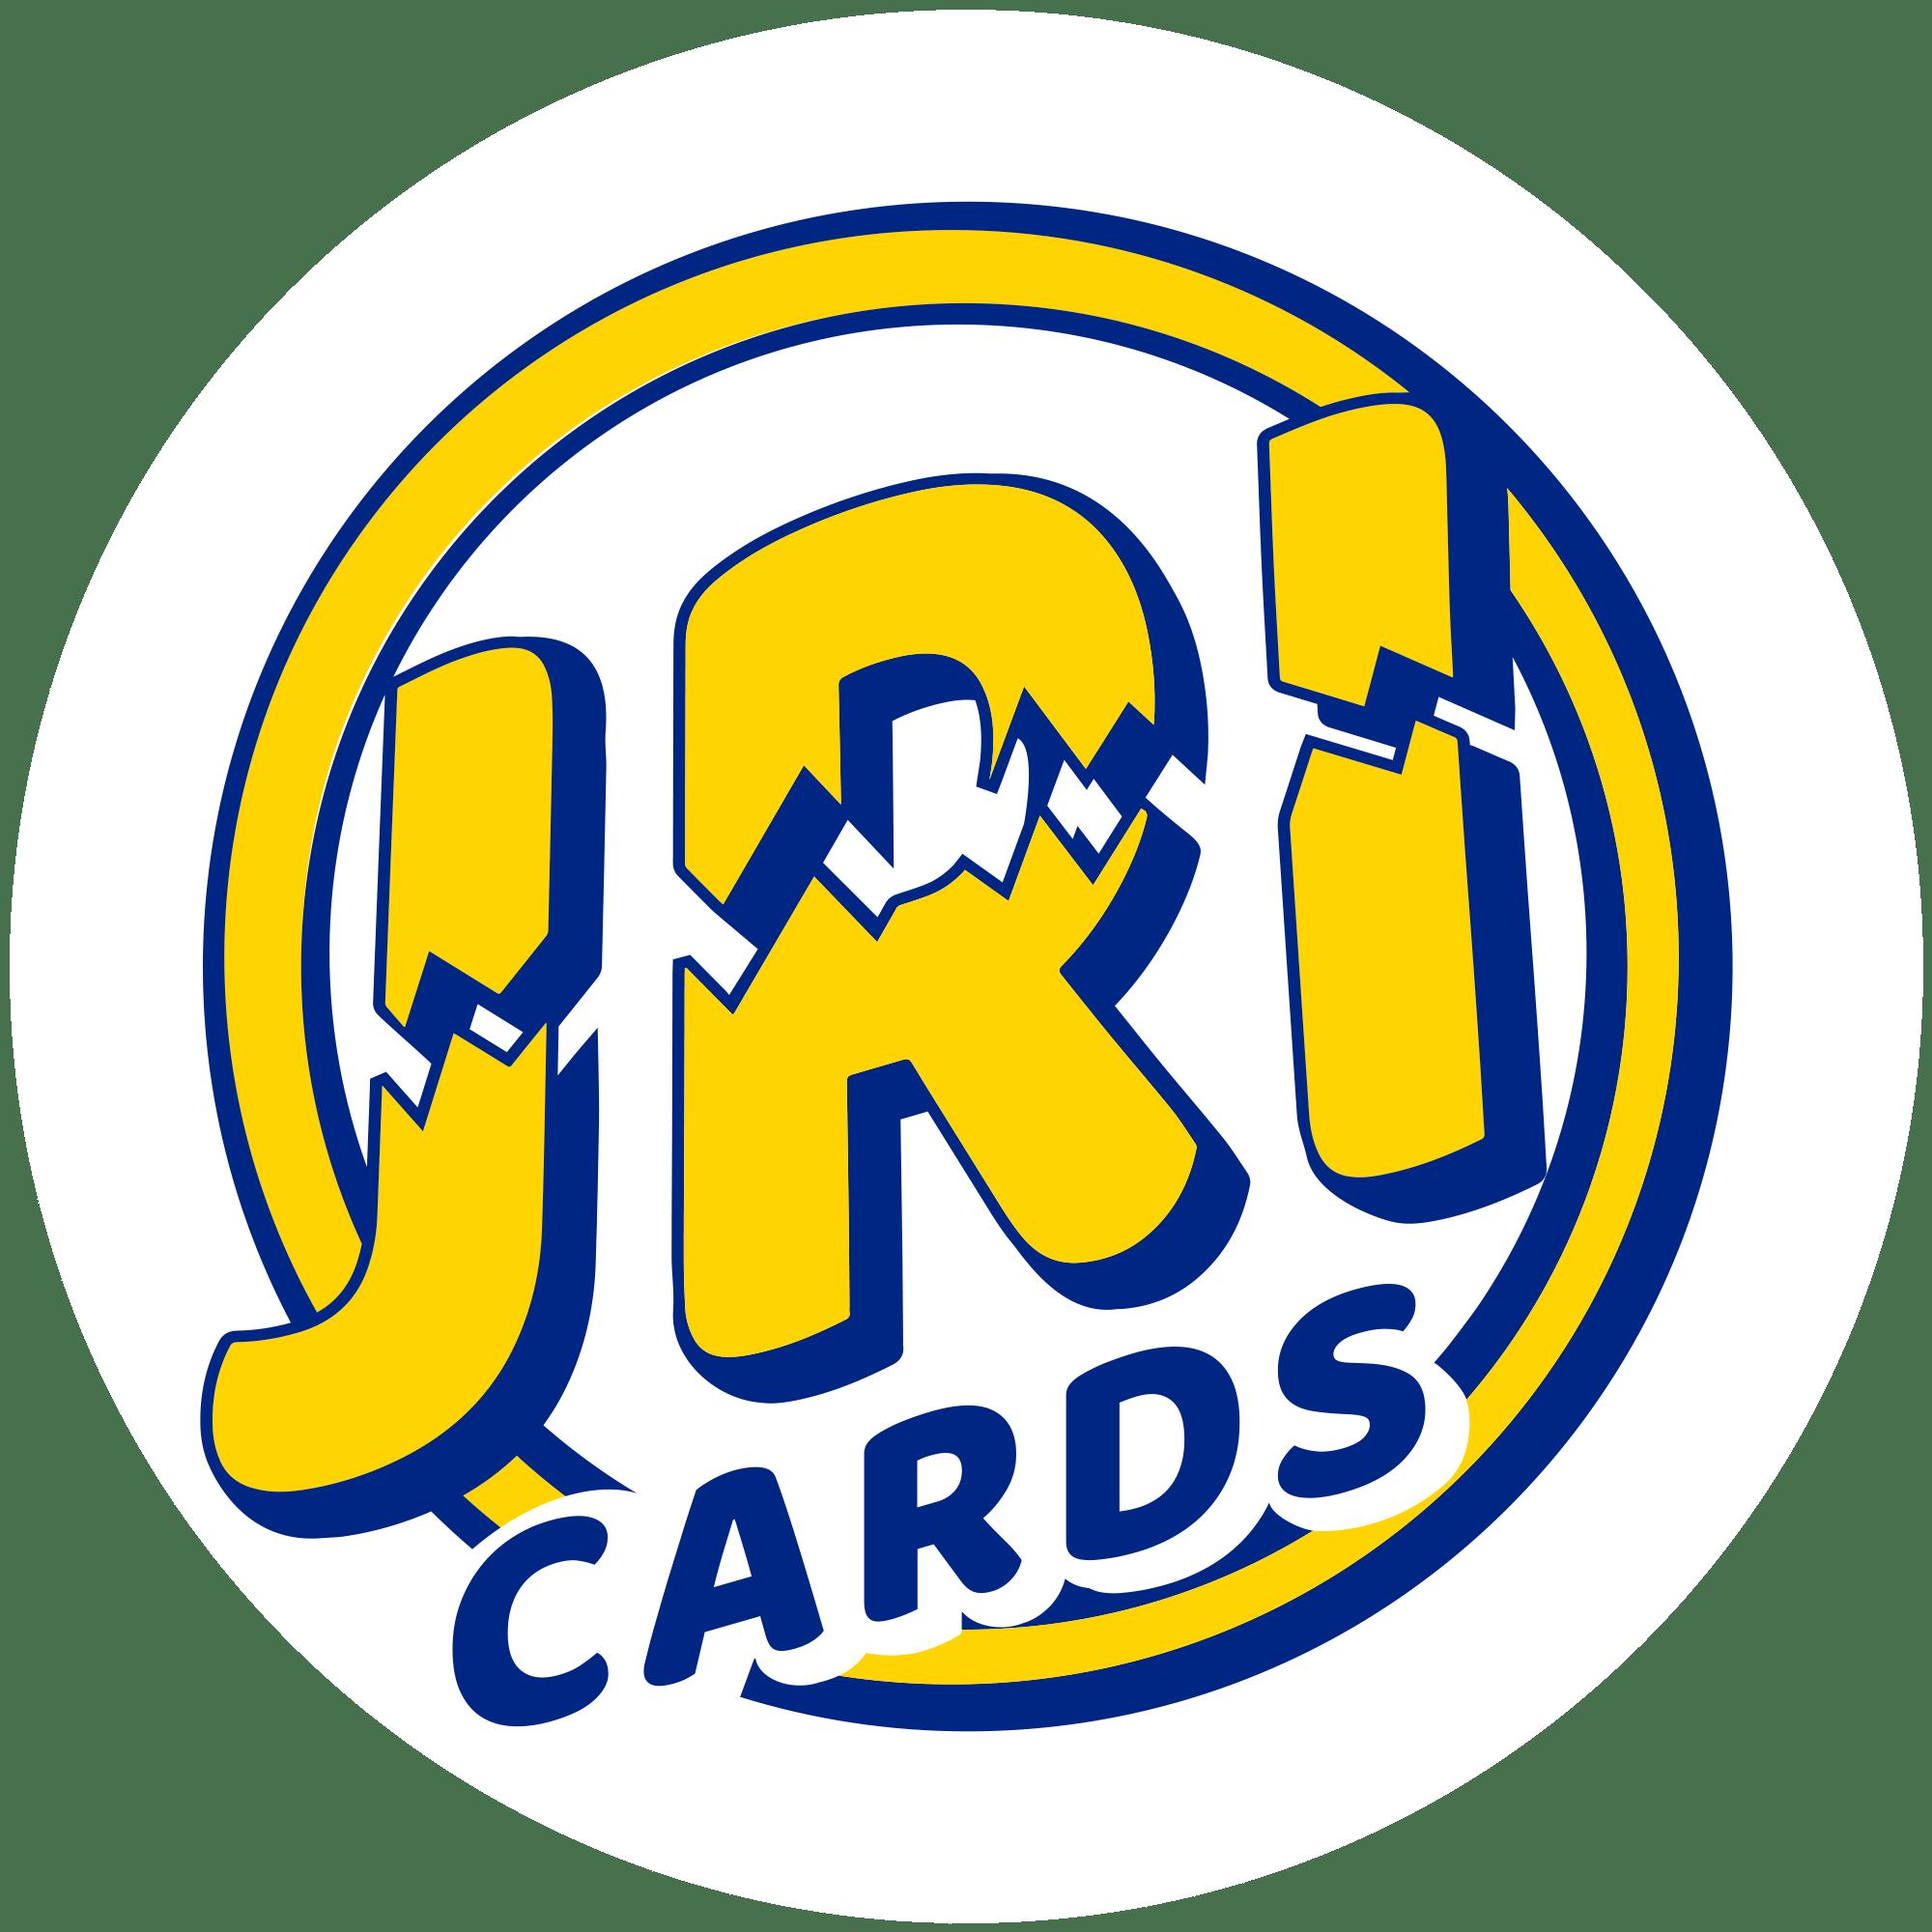 1975 TOPPS MINI BASEBALL WAX PACK (10 CARDS IN PACK)